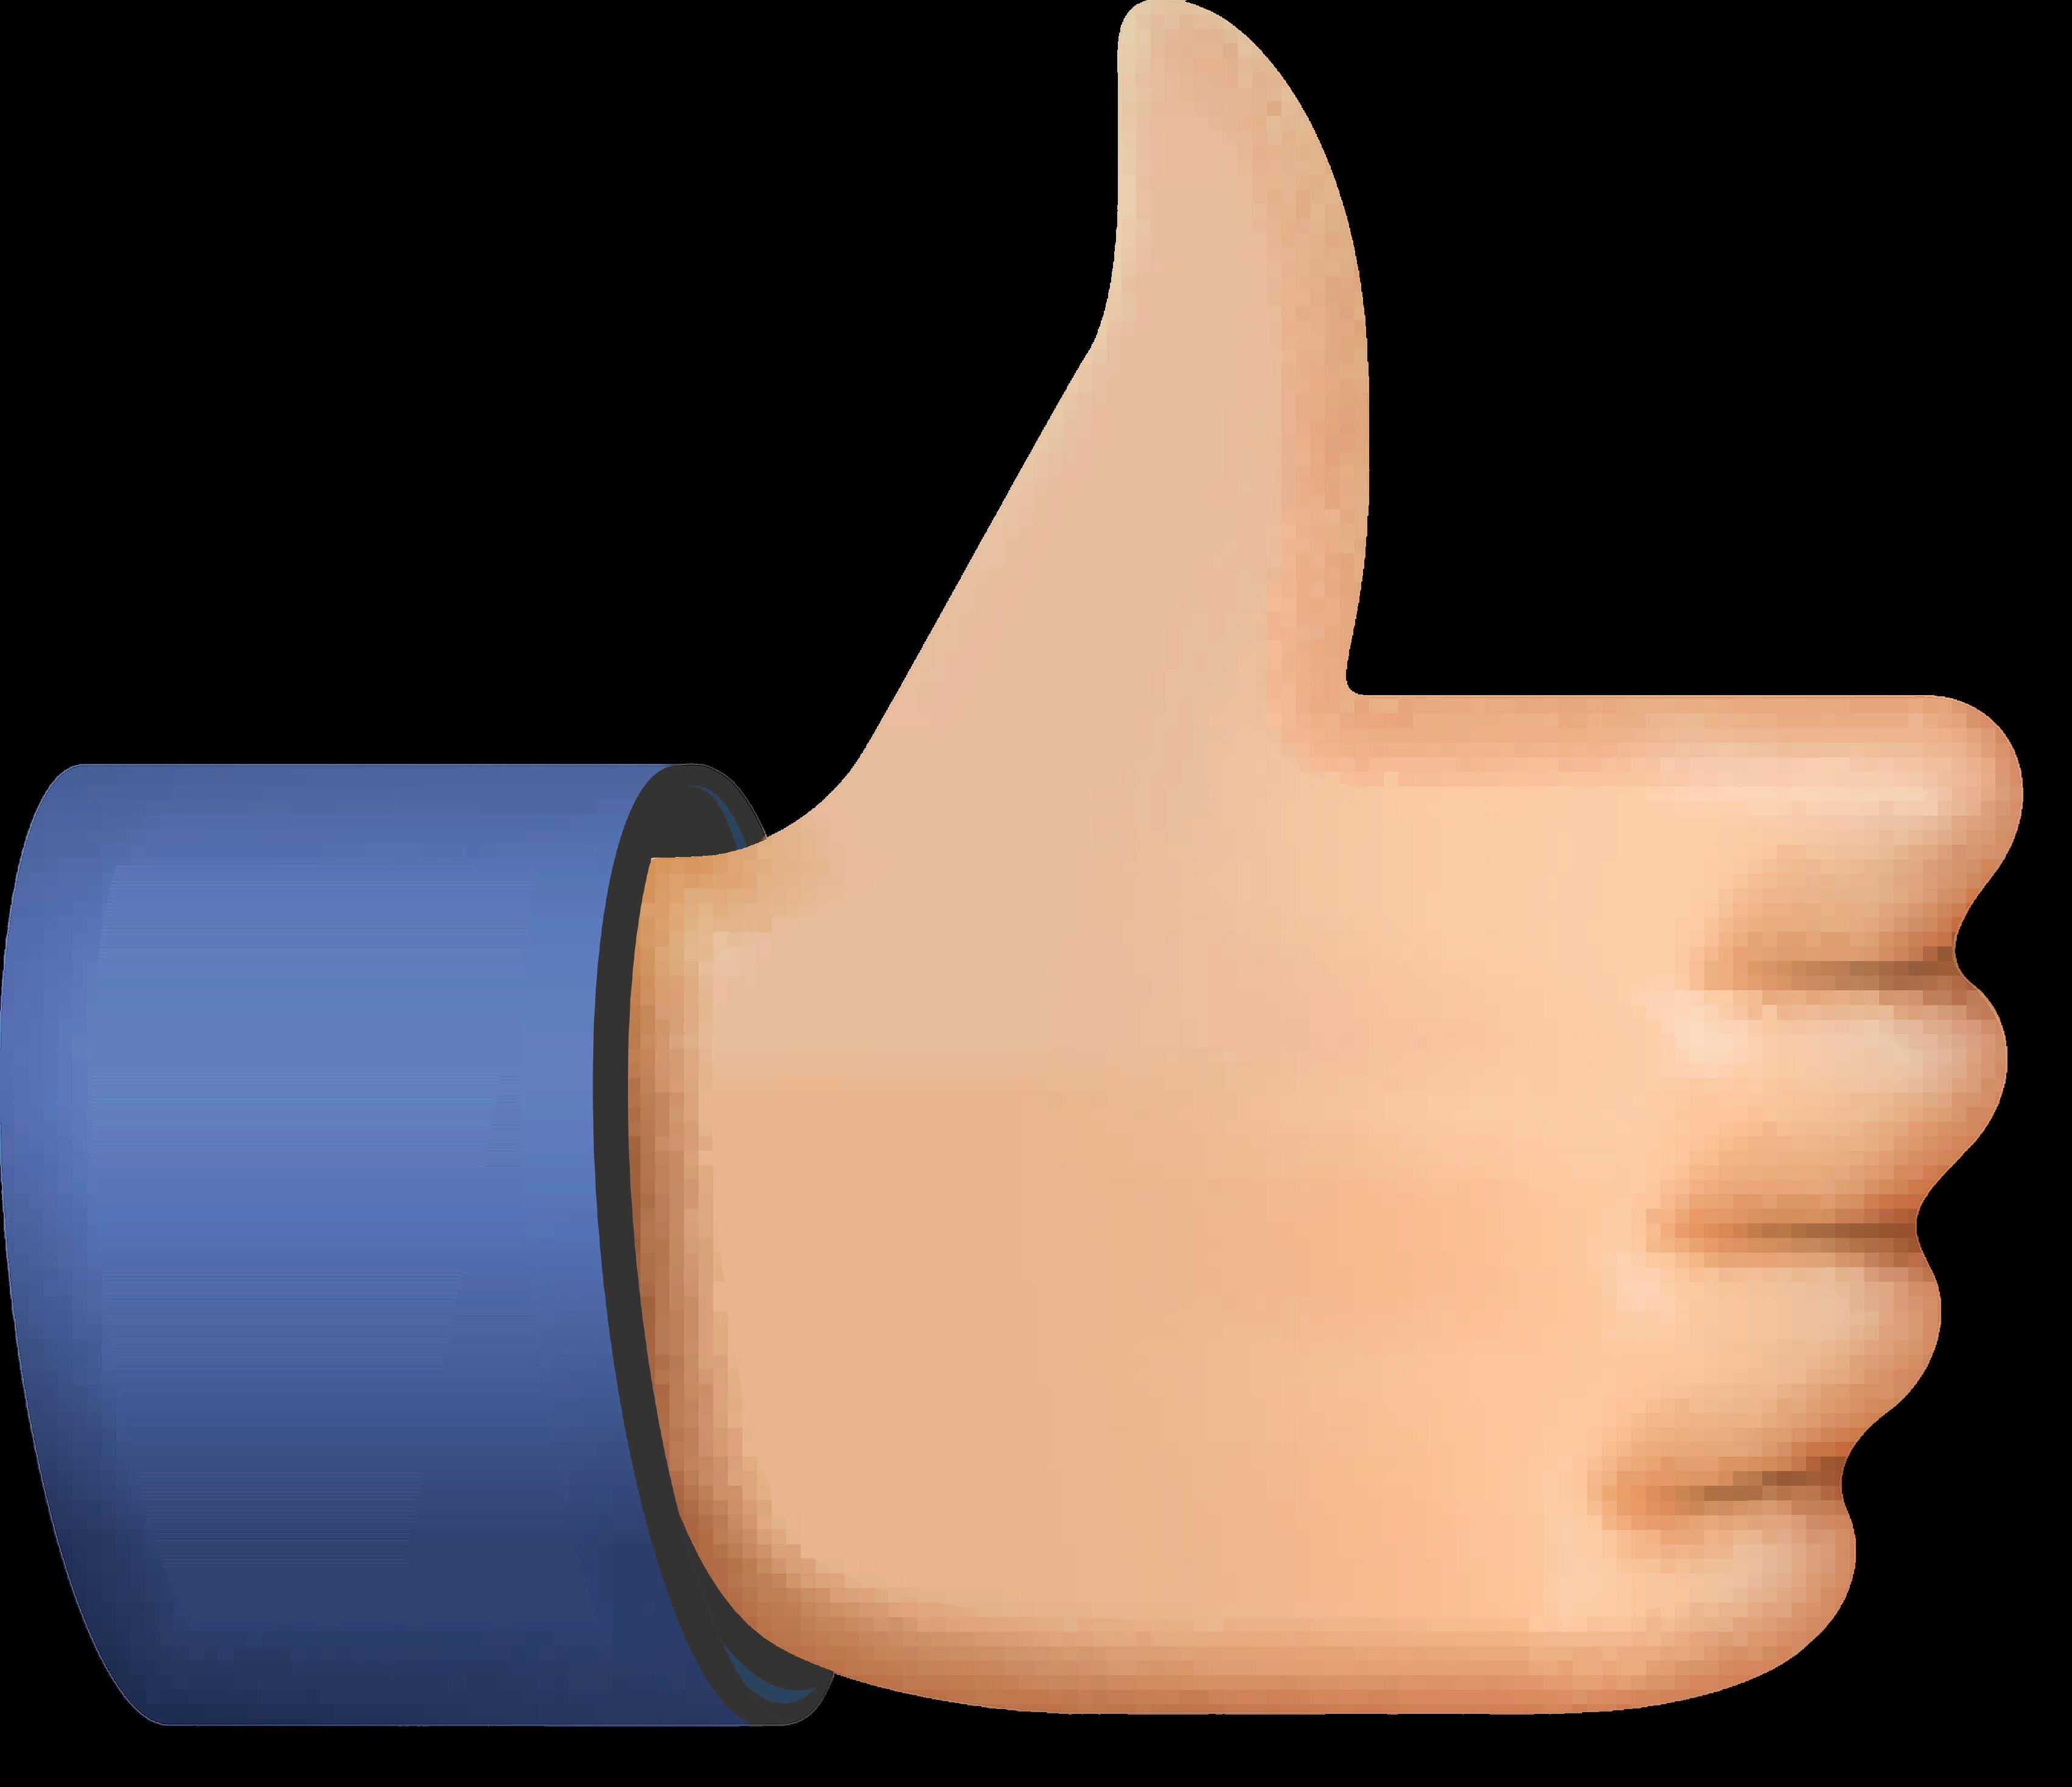 Like icon, emoji thumb up symbol, vector illustration.